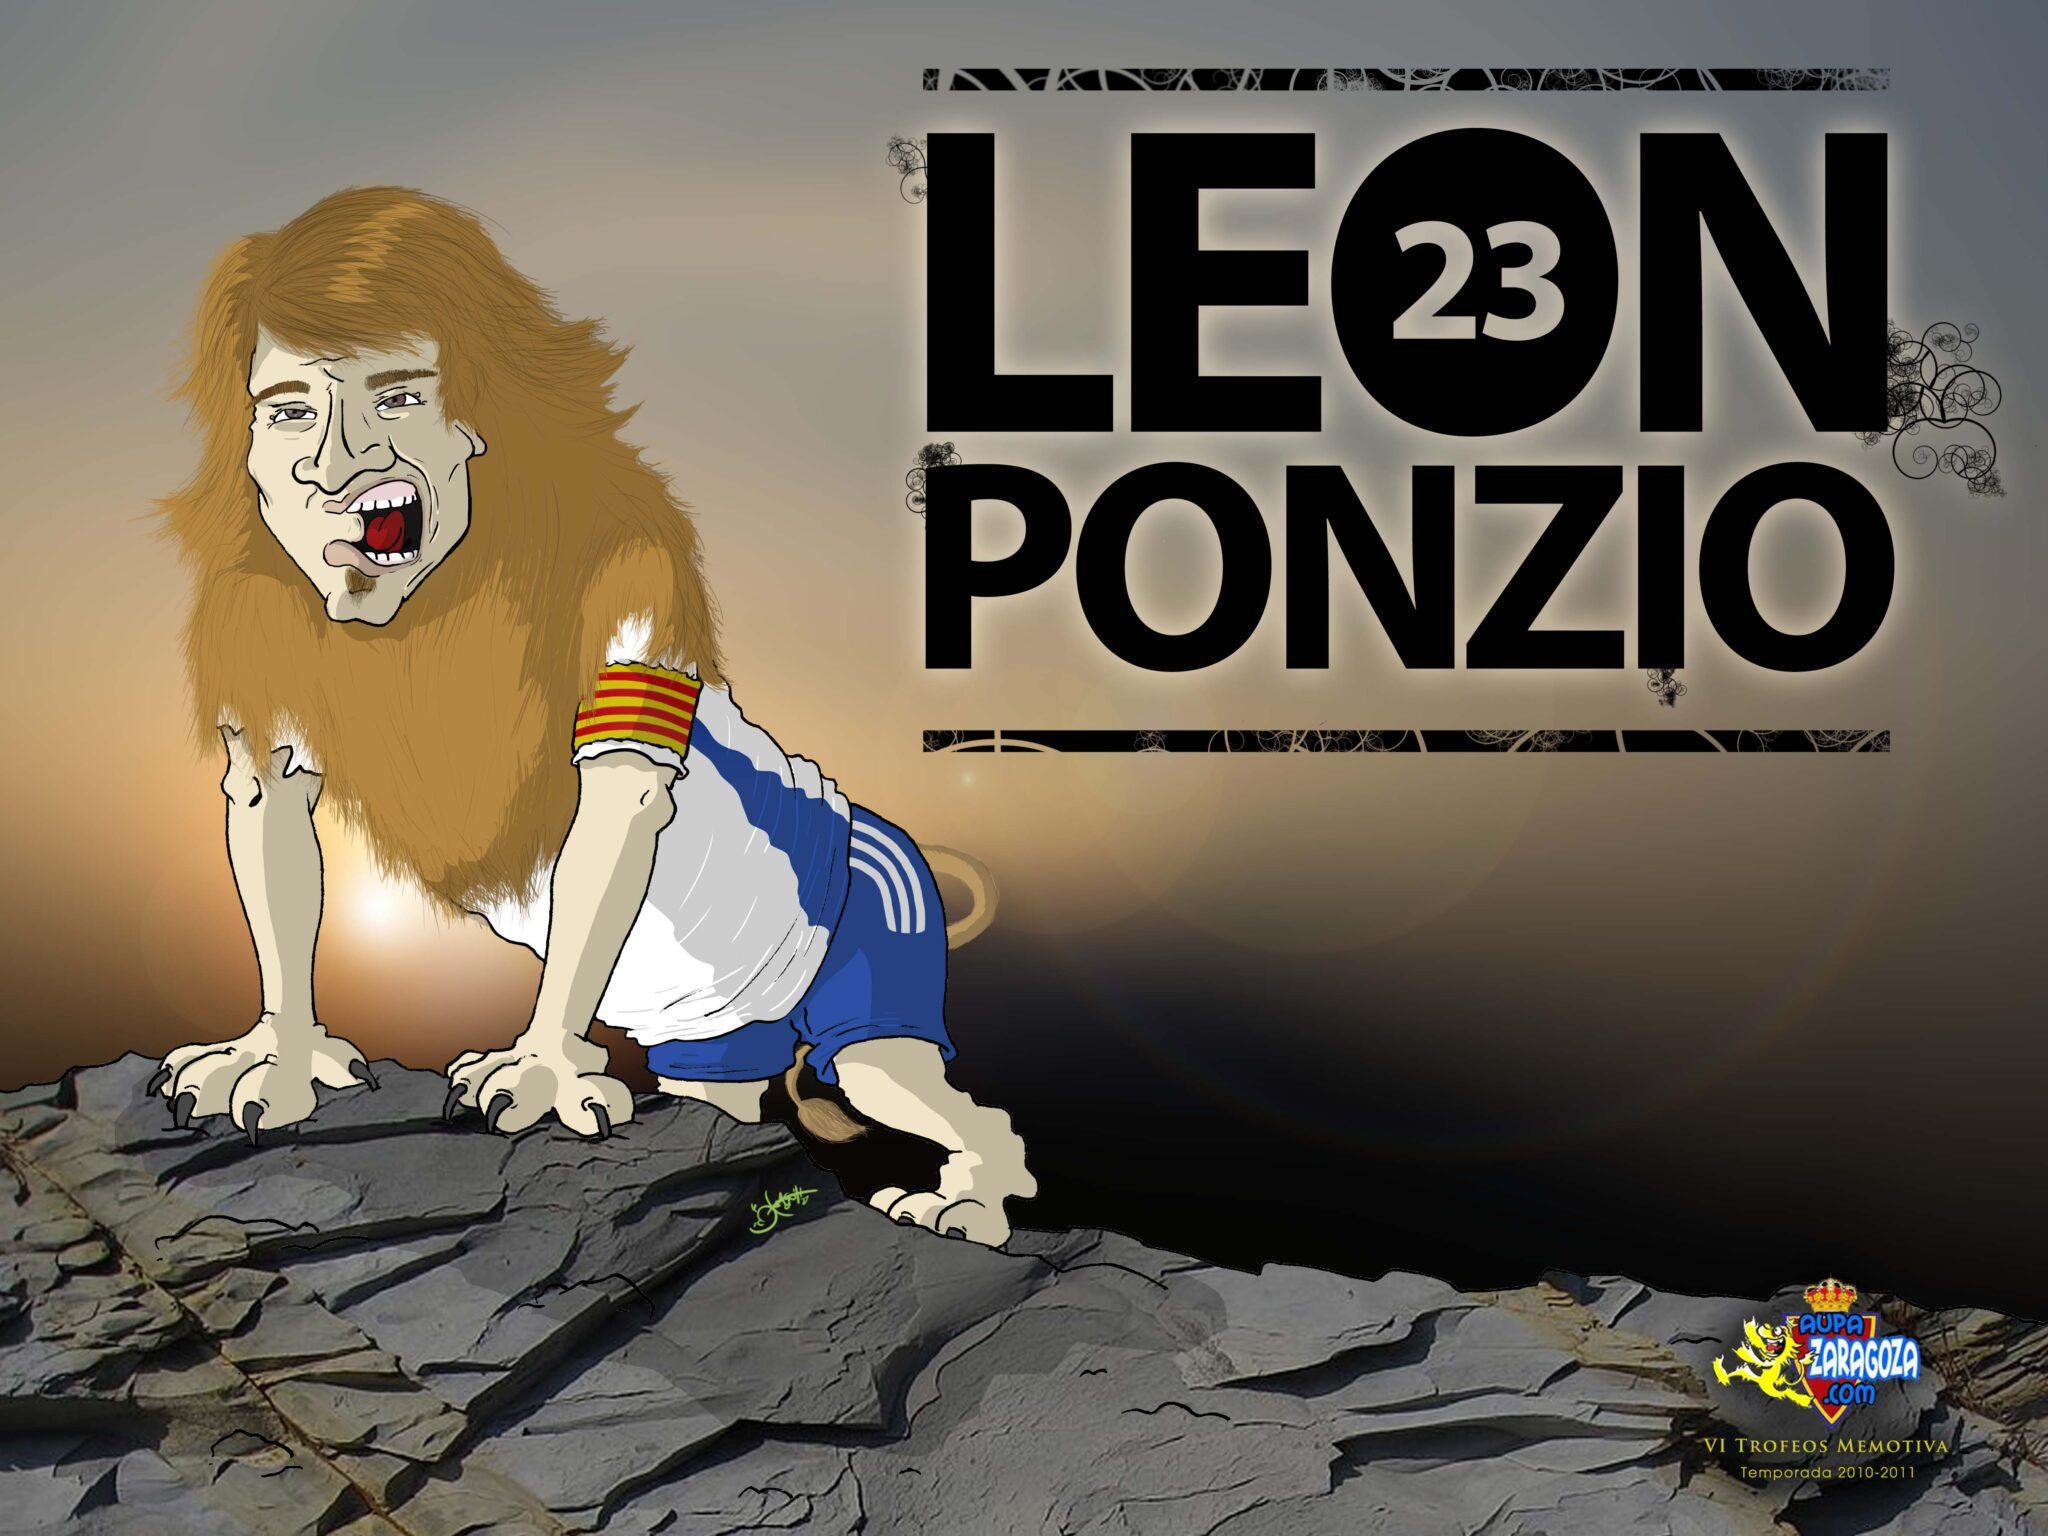 PONZIO.VI.MEMOTIVA